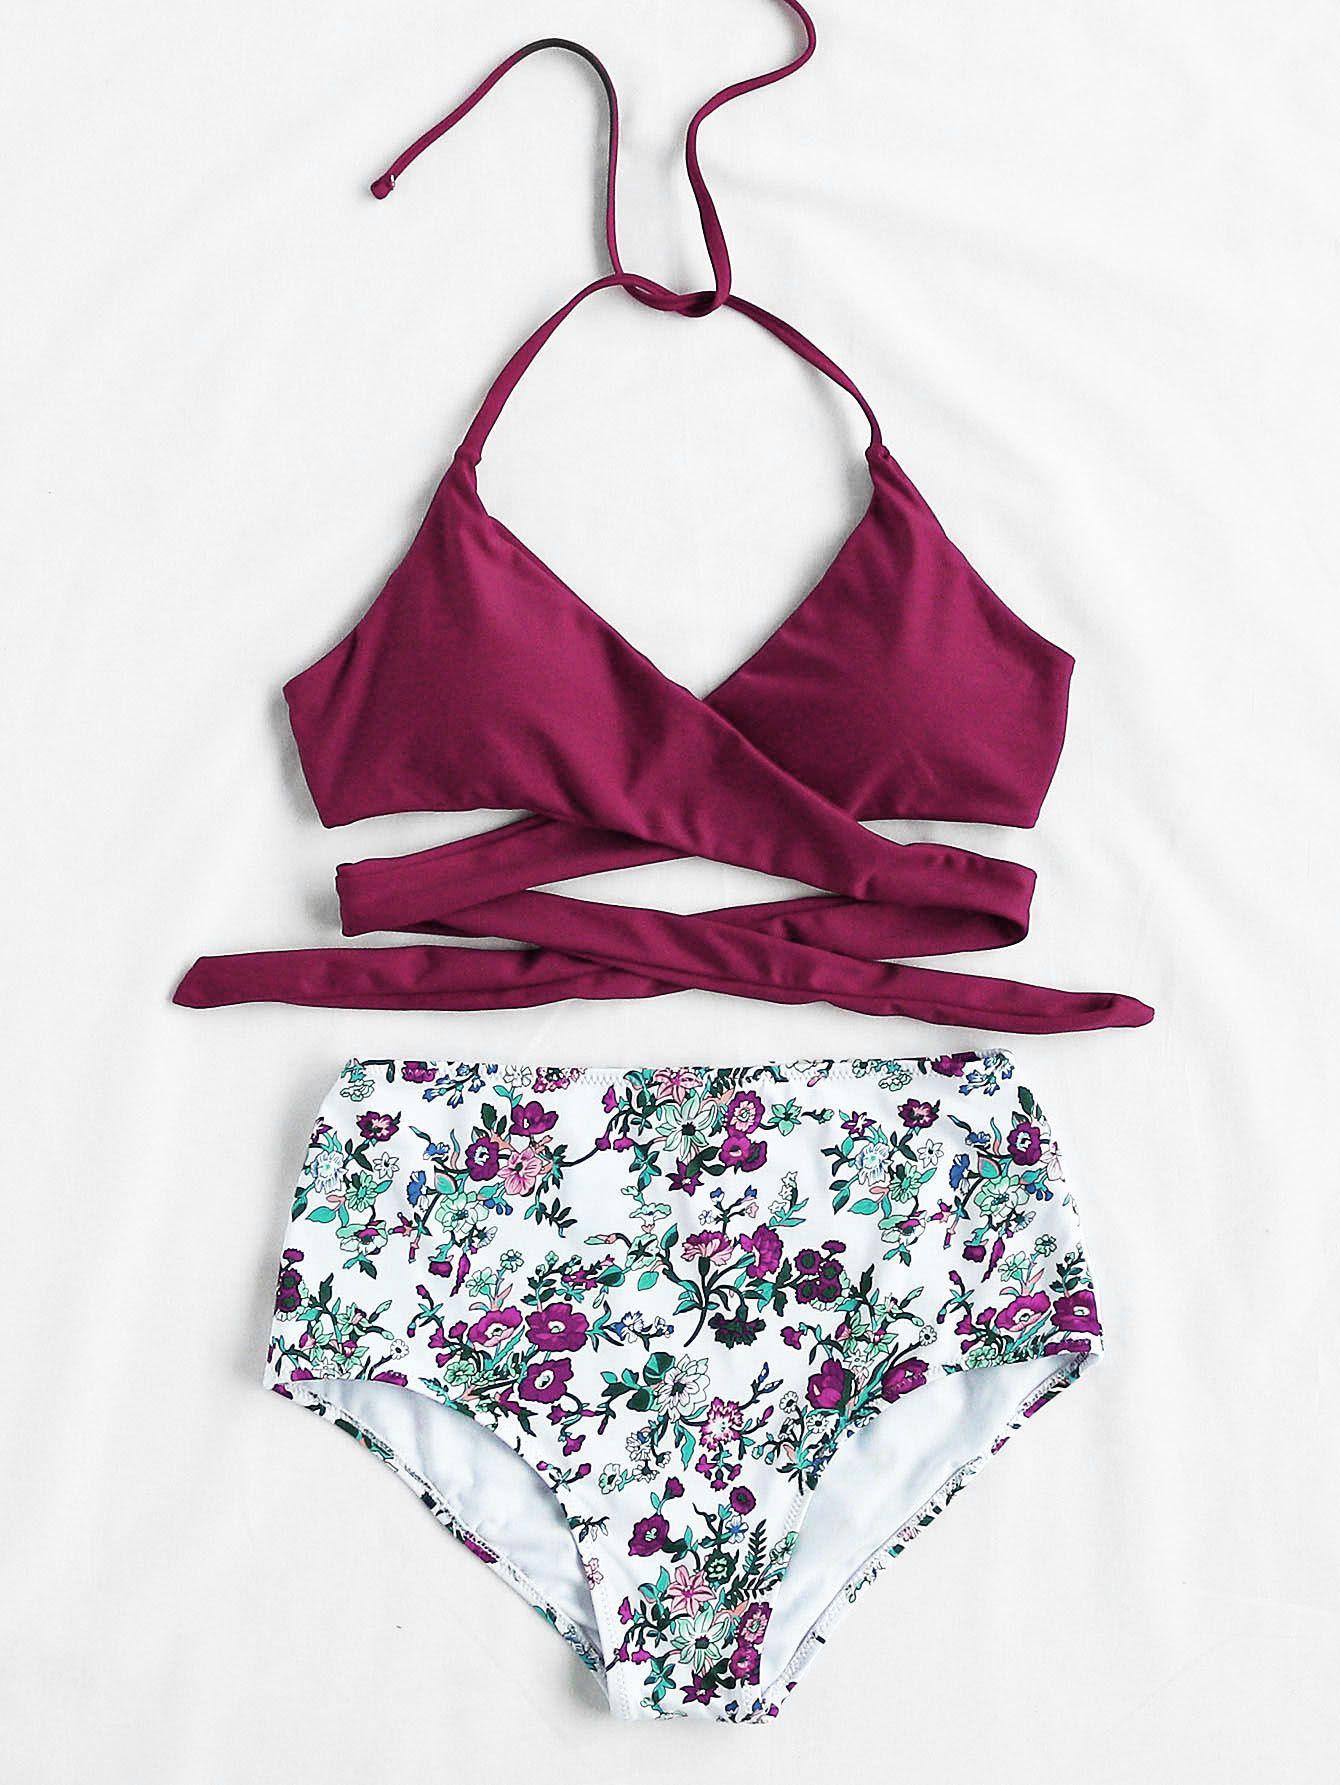 ee7e852c8 Shein Calico Print High Waist Wrap Bikini Set in 2019 | Fashion ...